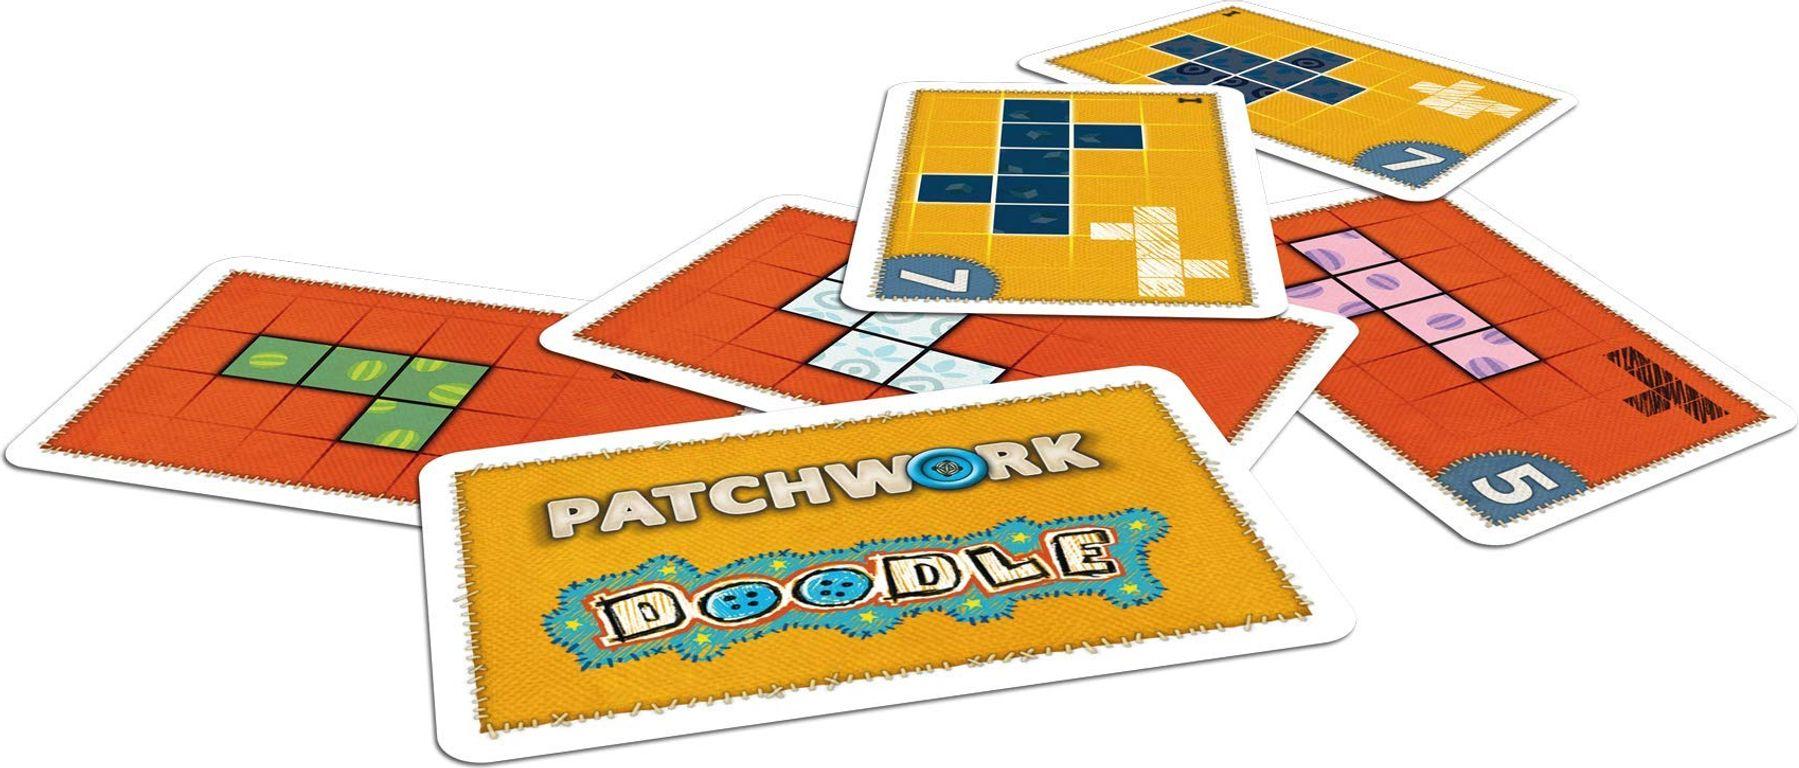 Patchwork Doodle cards